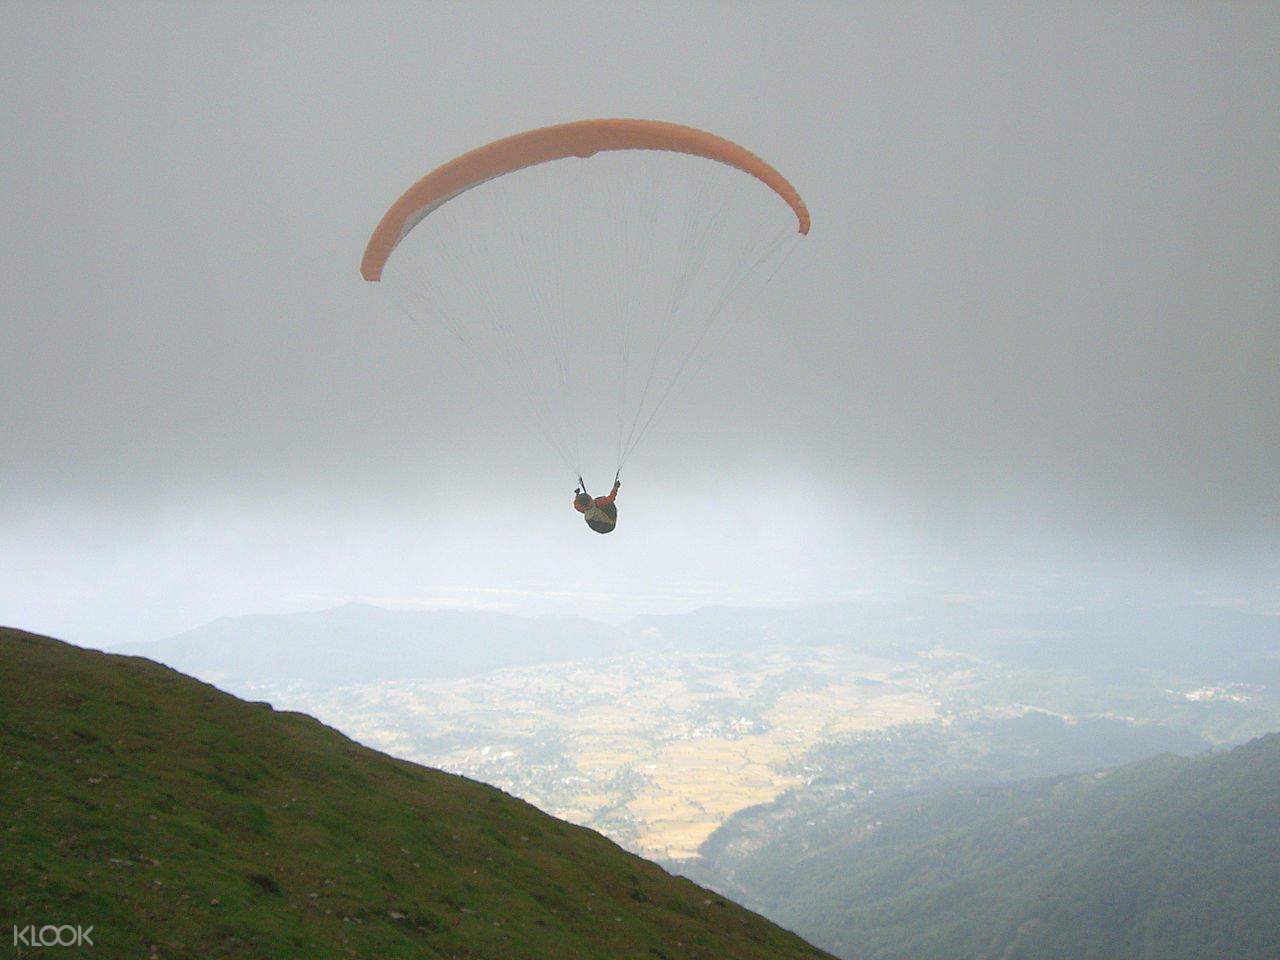 Bir Billing喜馬偕爾邦徒步探險滑翔傘